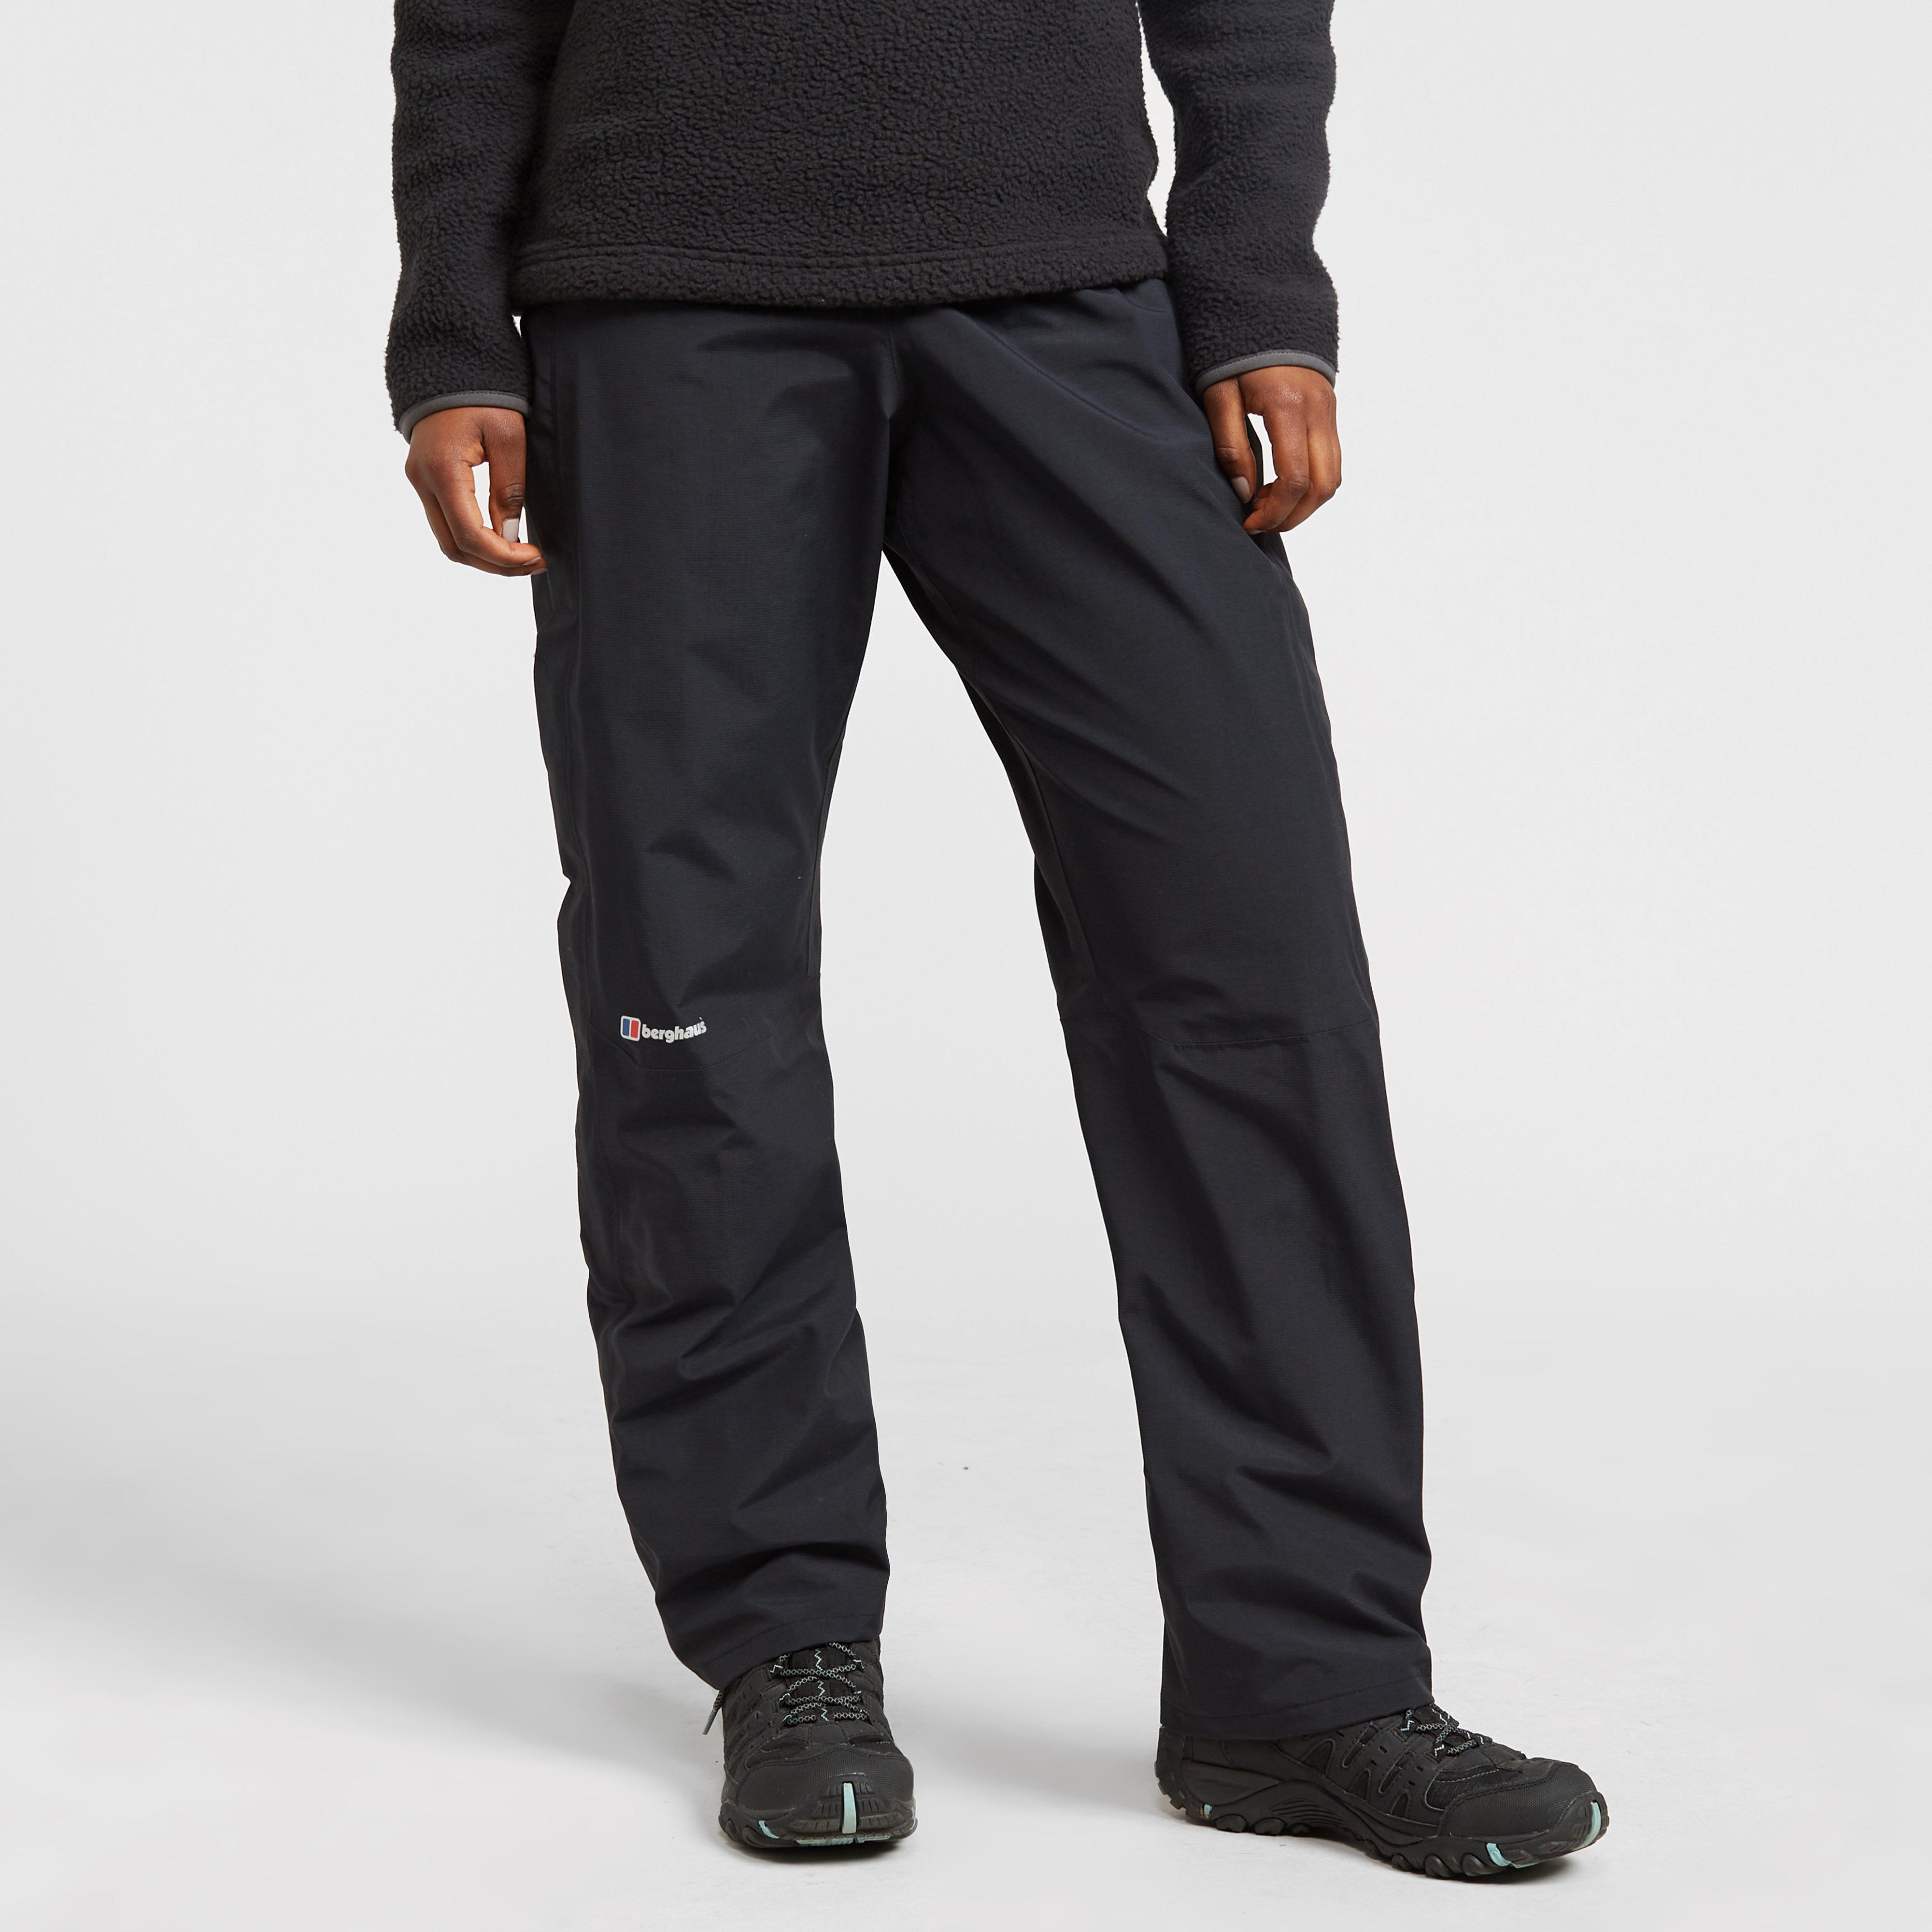 Berghaus Women's Maitland Gore-Tex Waterproof Trousers (Regular) - R/R, R/R